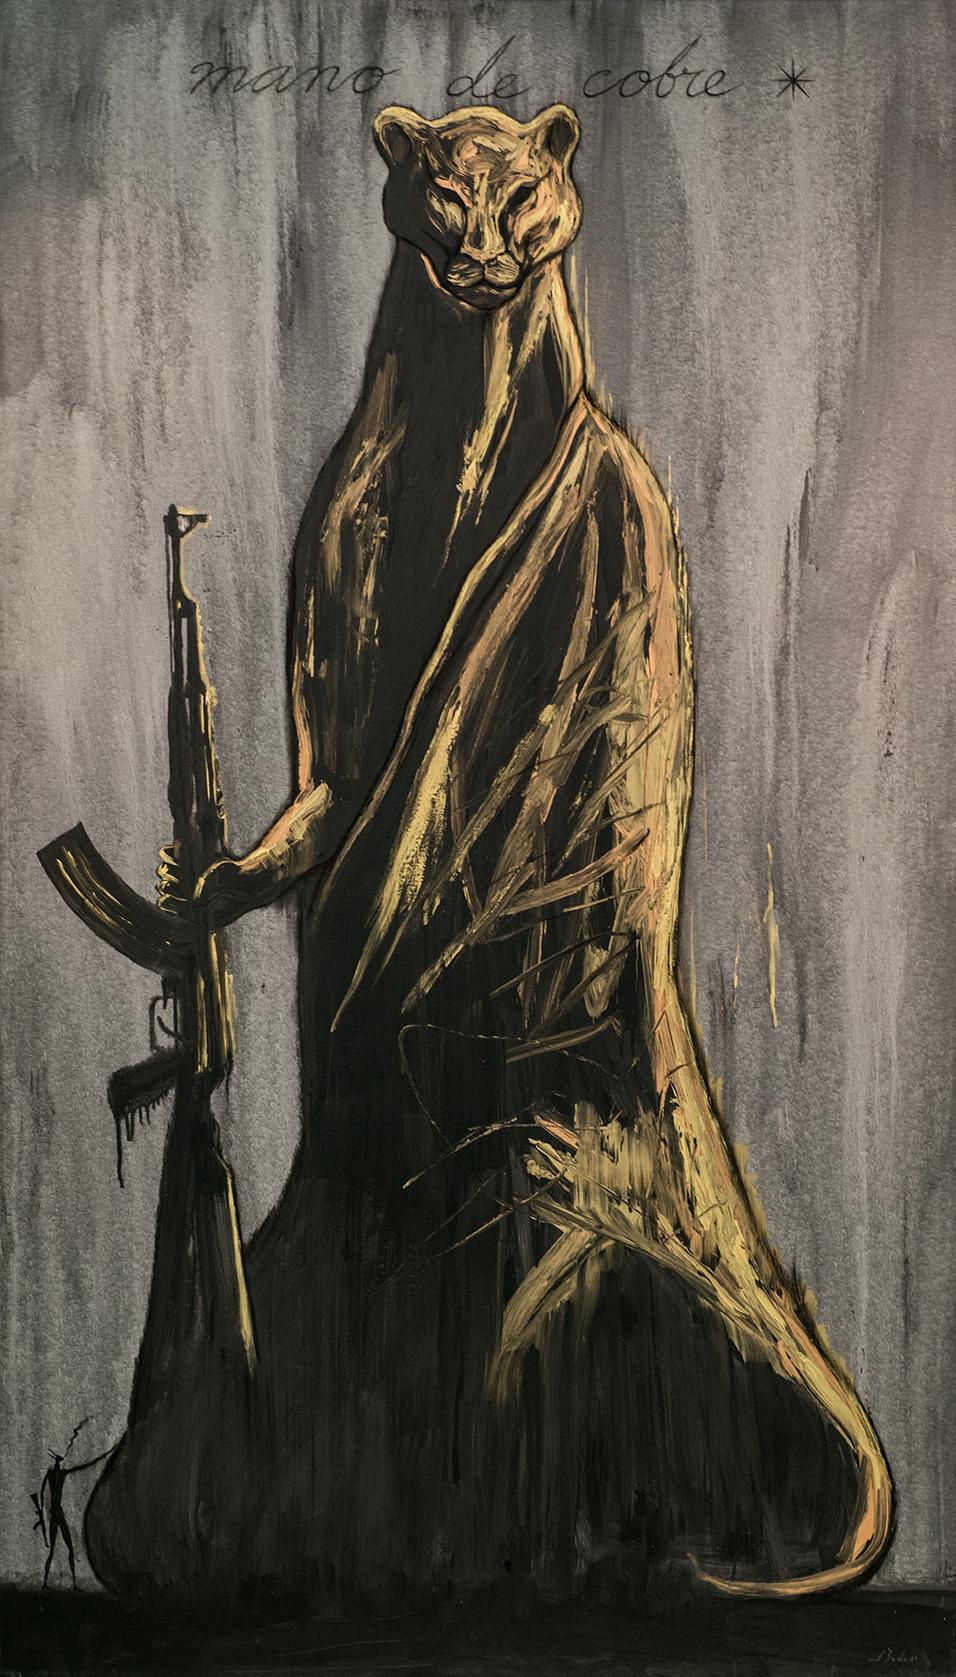 "mano de cobre –Acrylic on Canvas |H. 102.5"" x W. 59.5"" |2009"